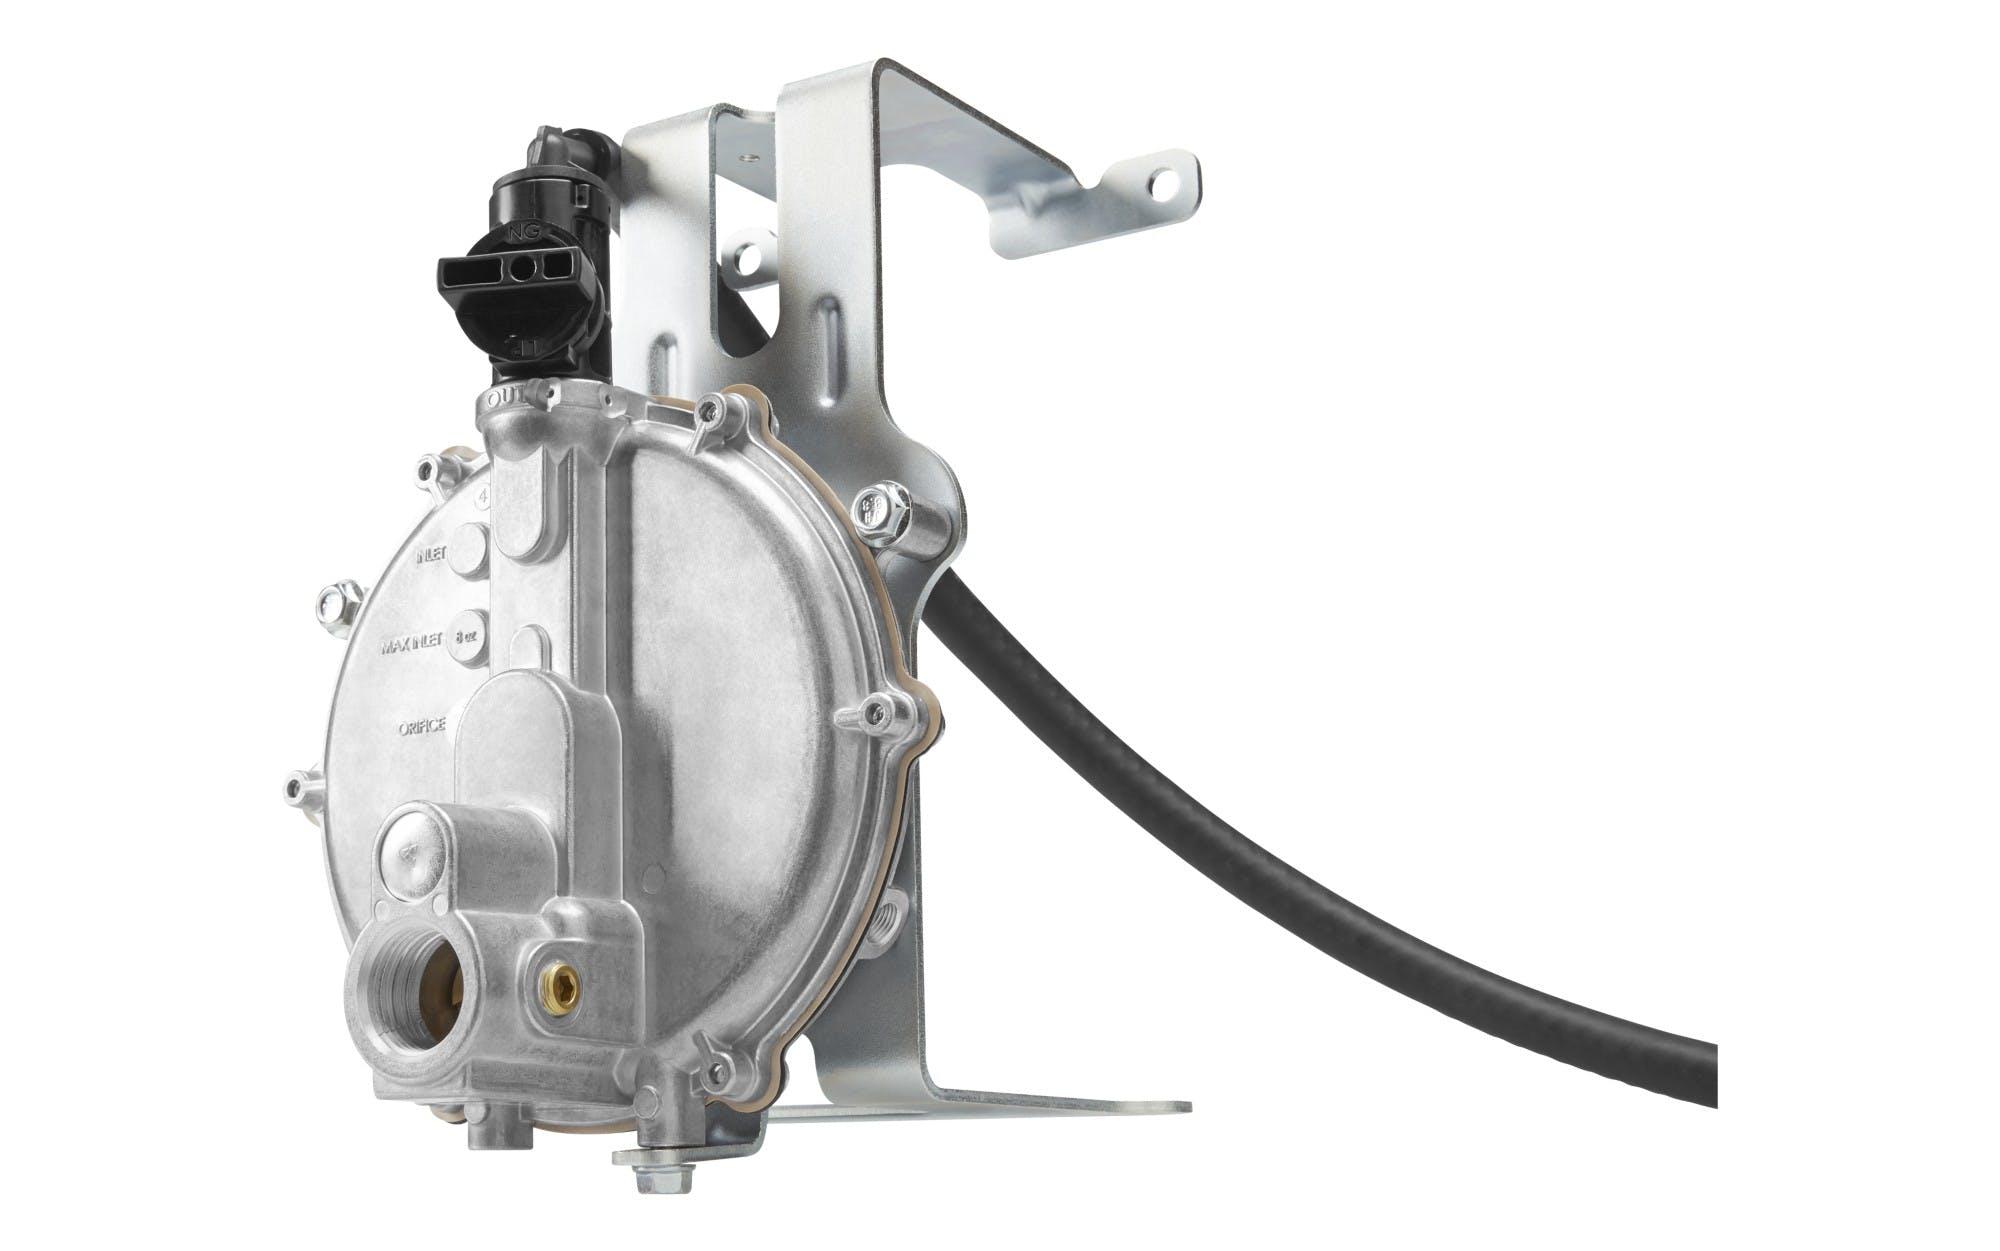 Tri-Fuel Regulator Kit